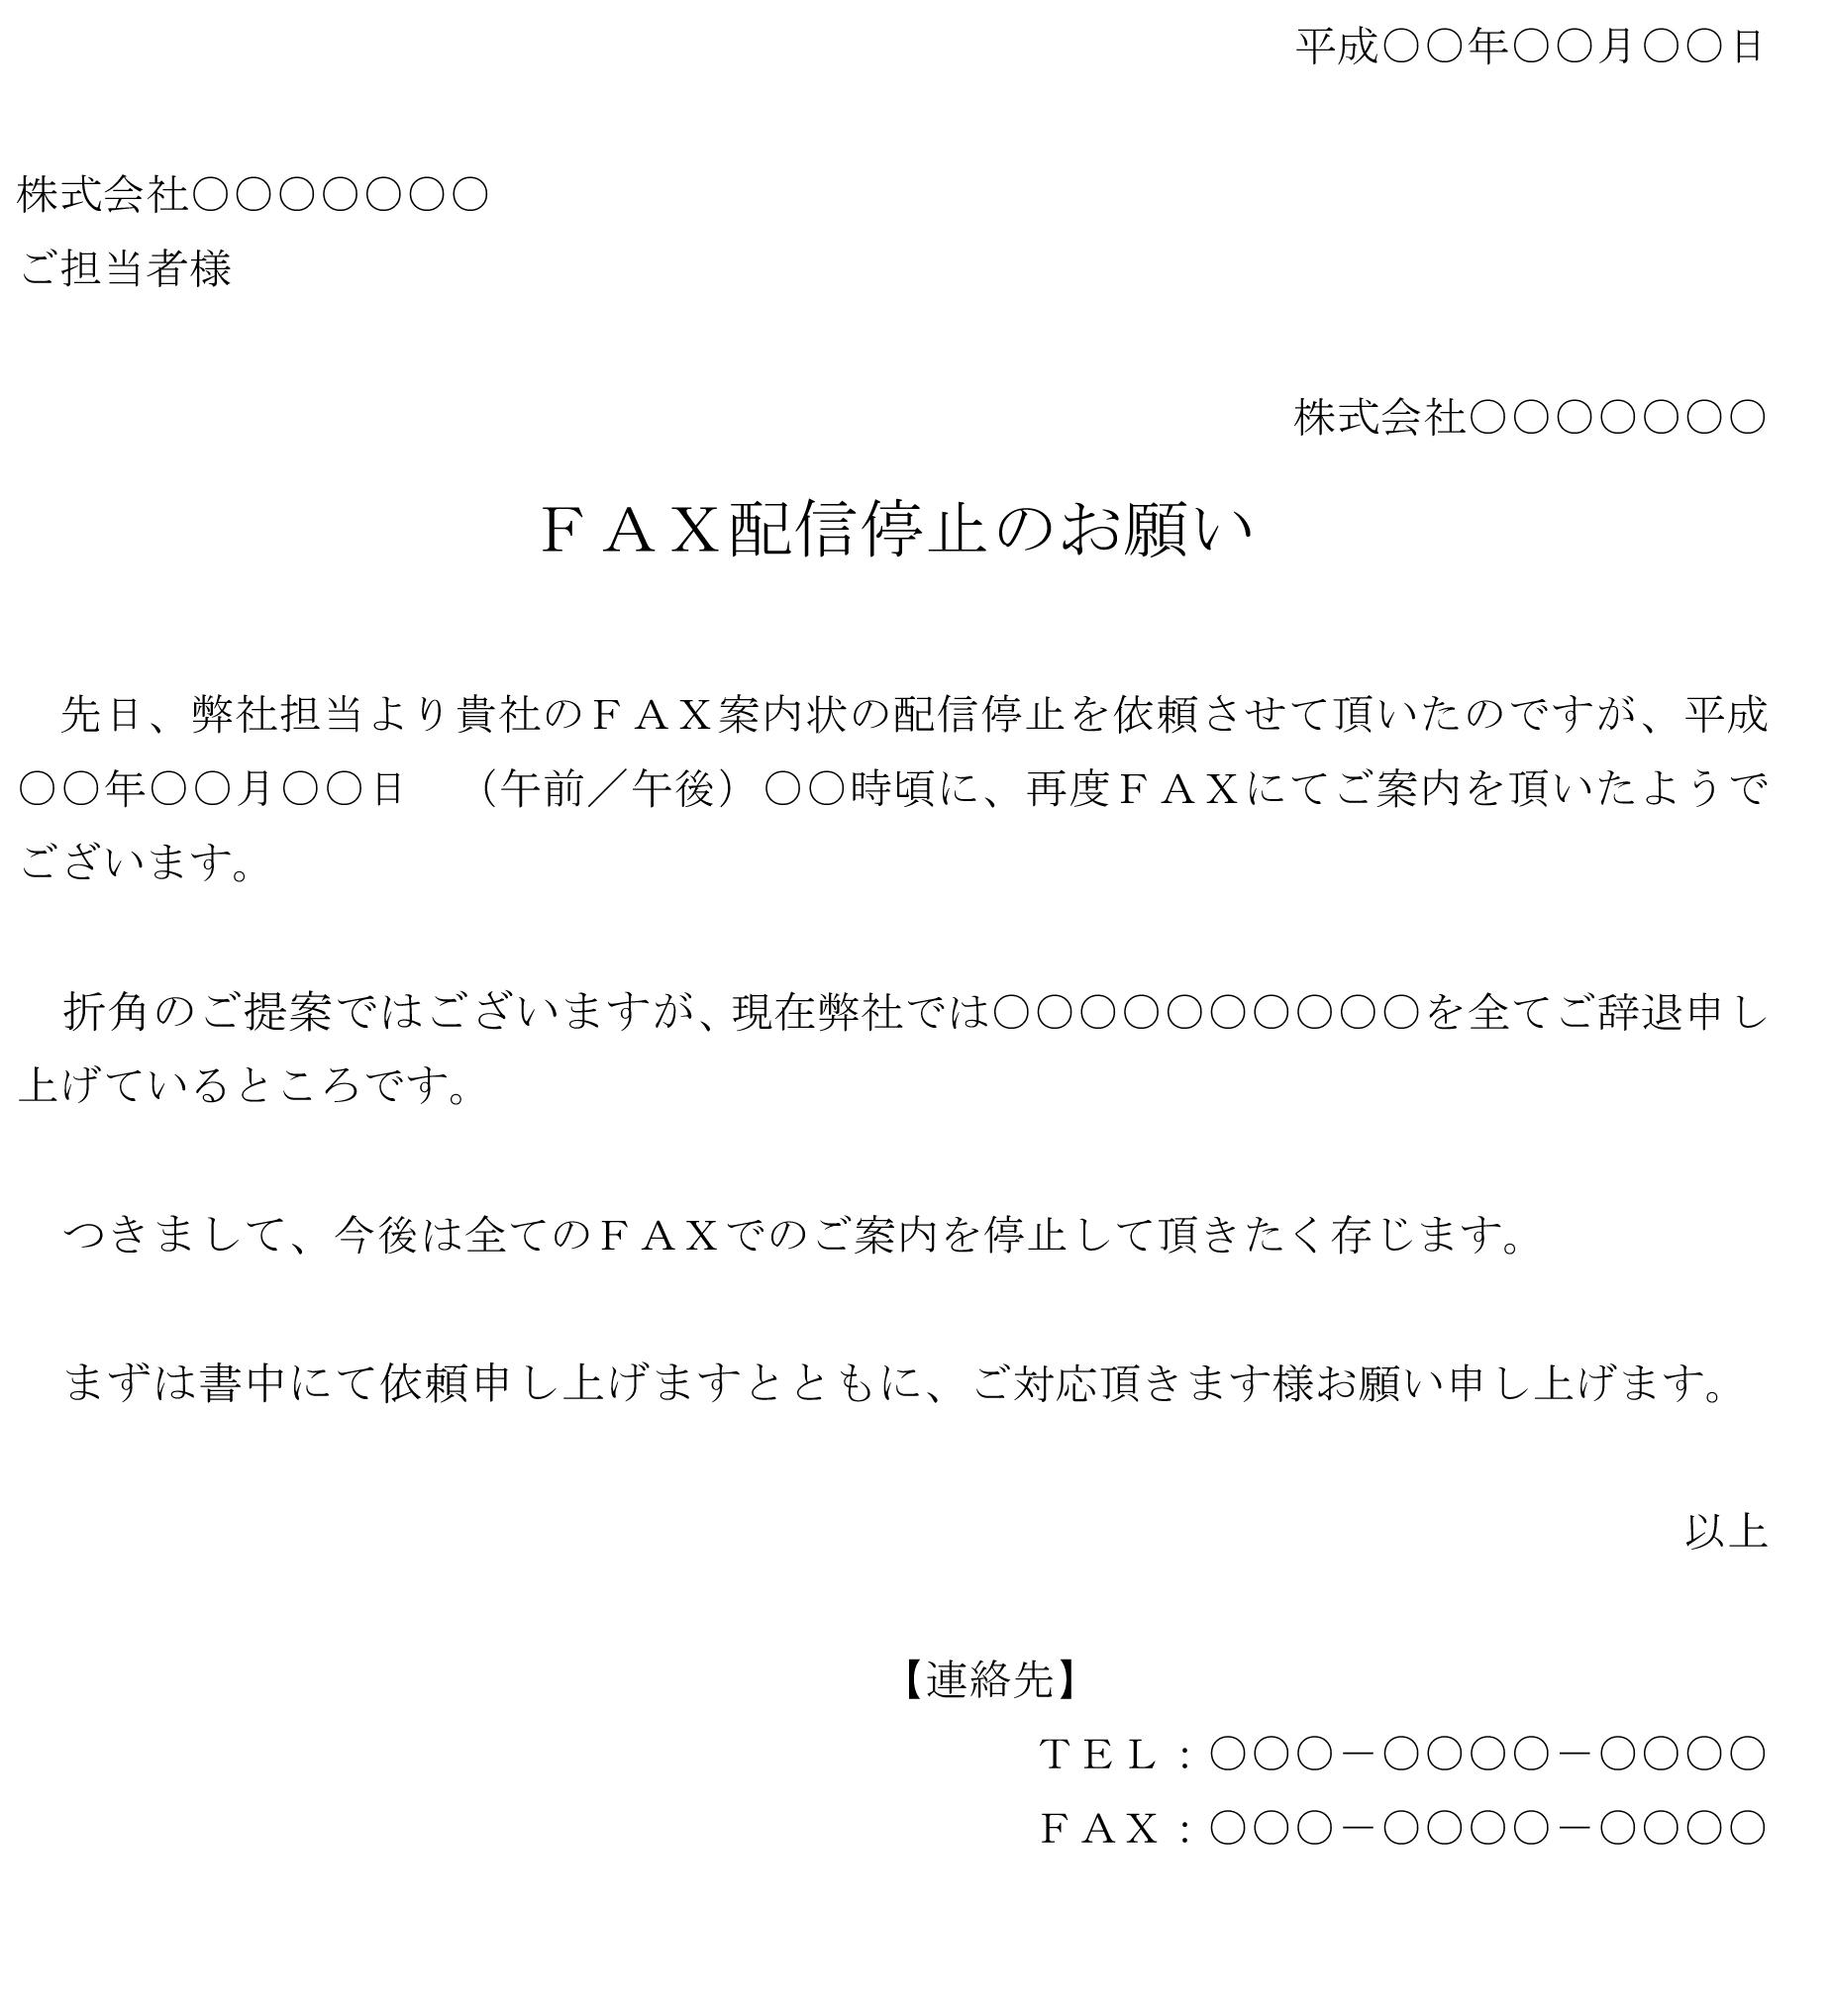 断り状(FAX配信停止)02